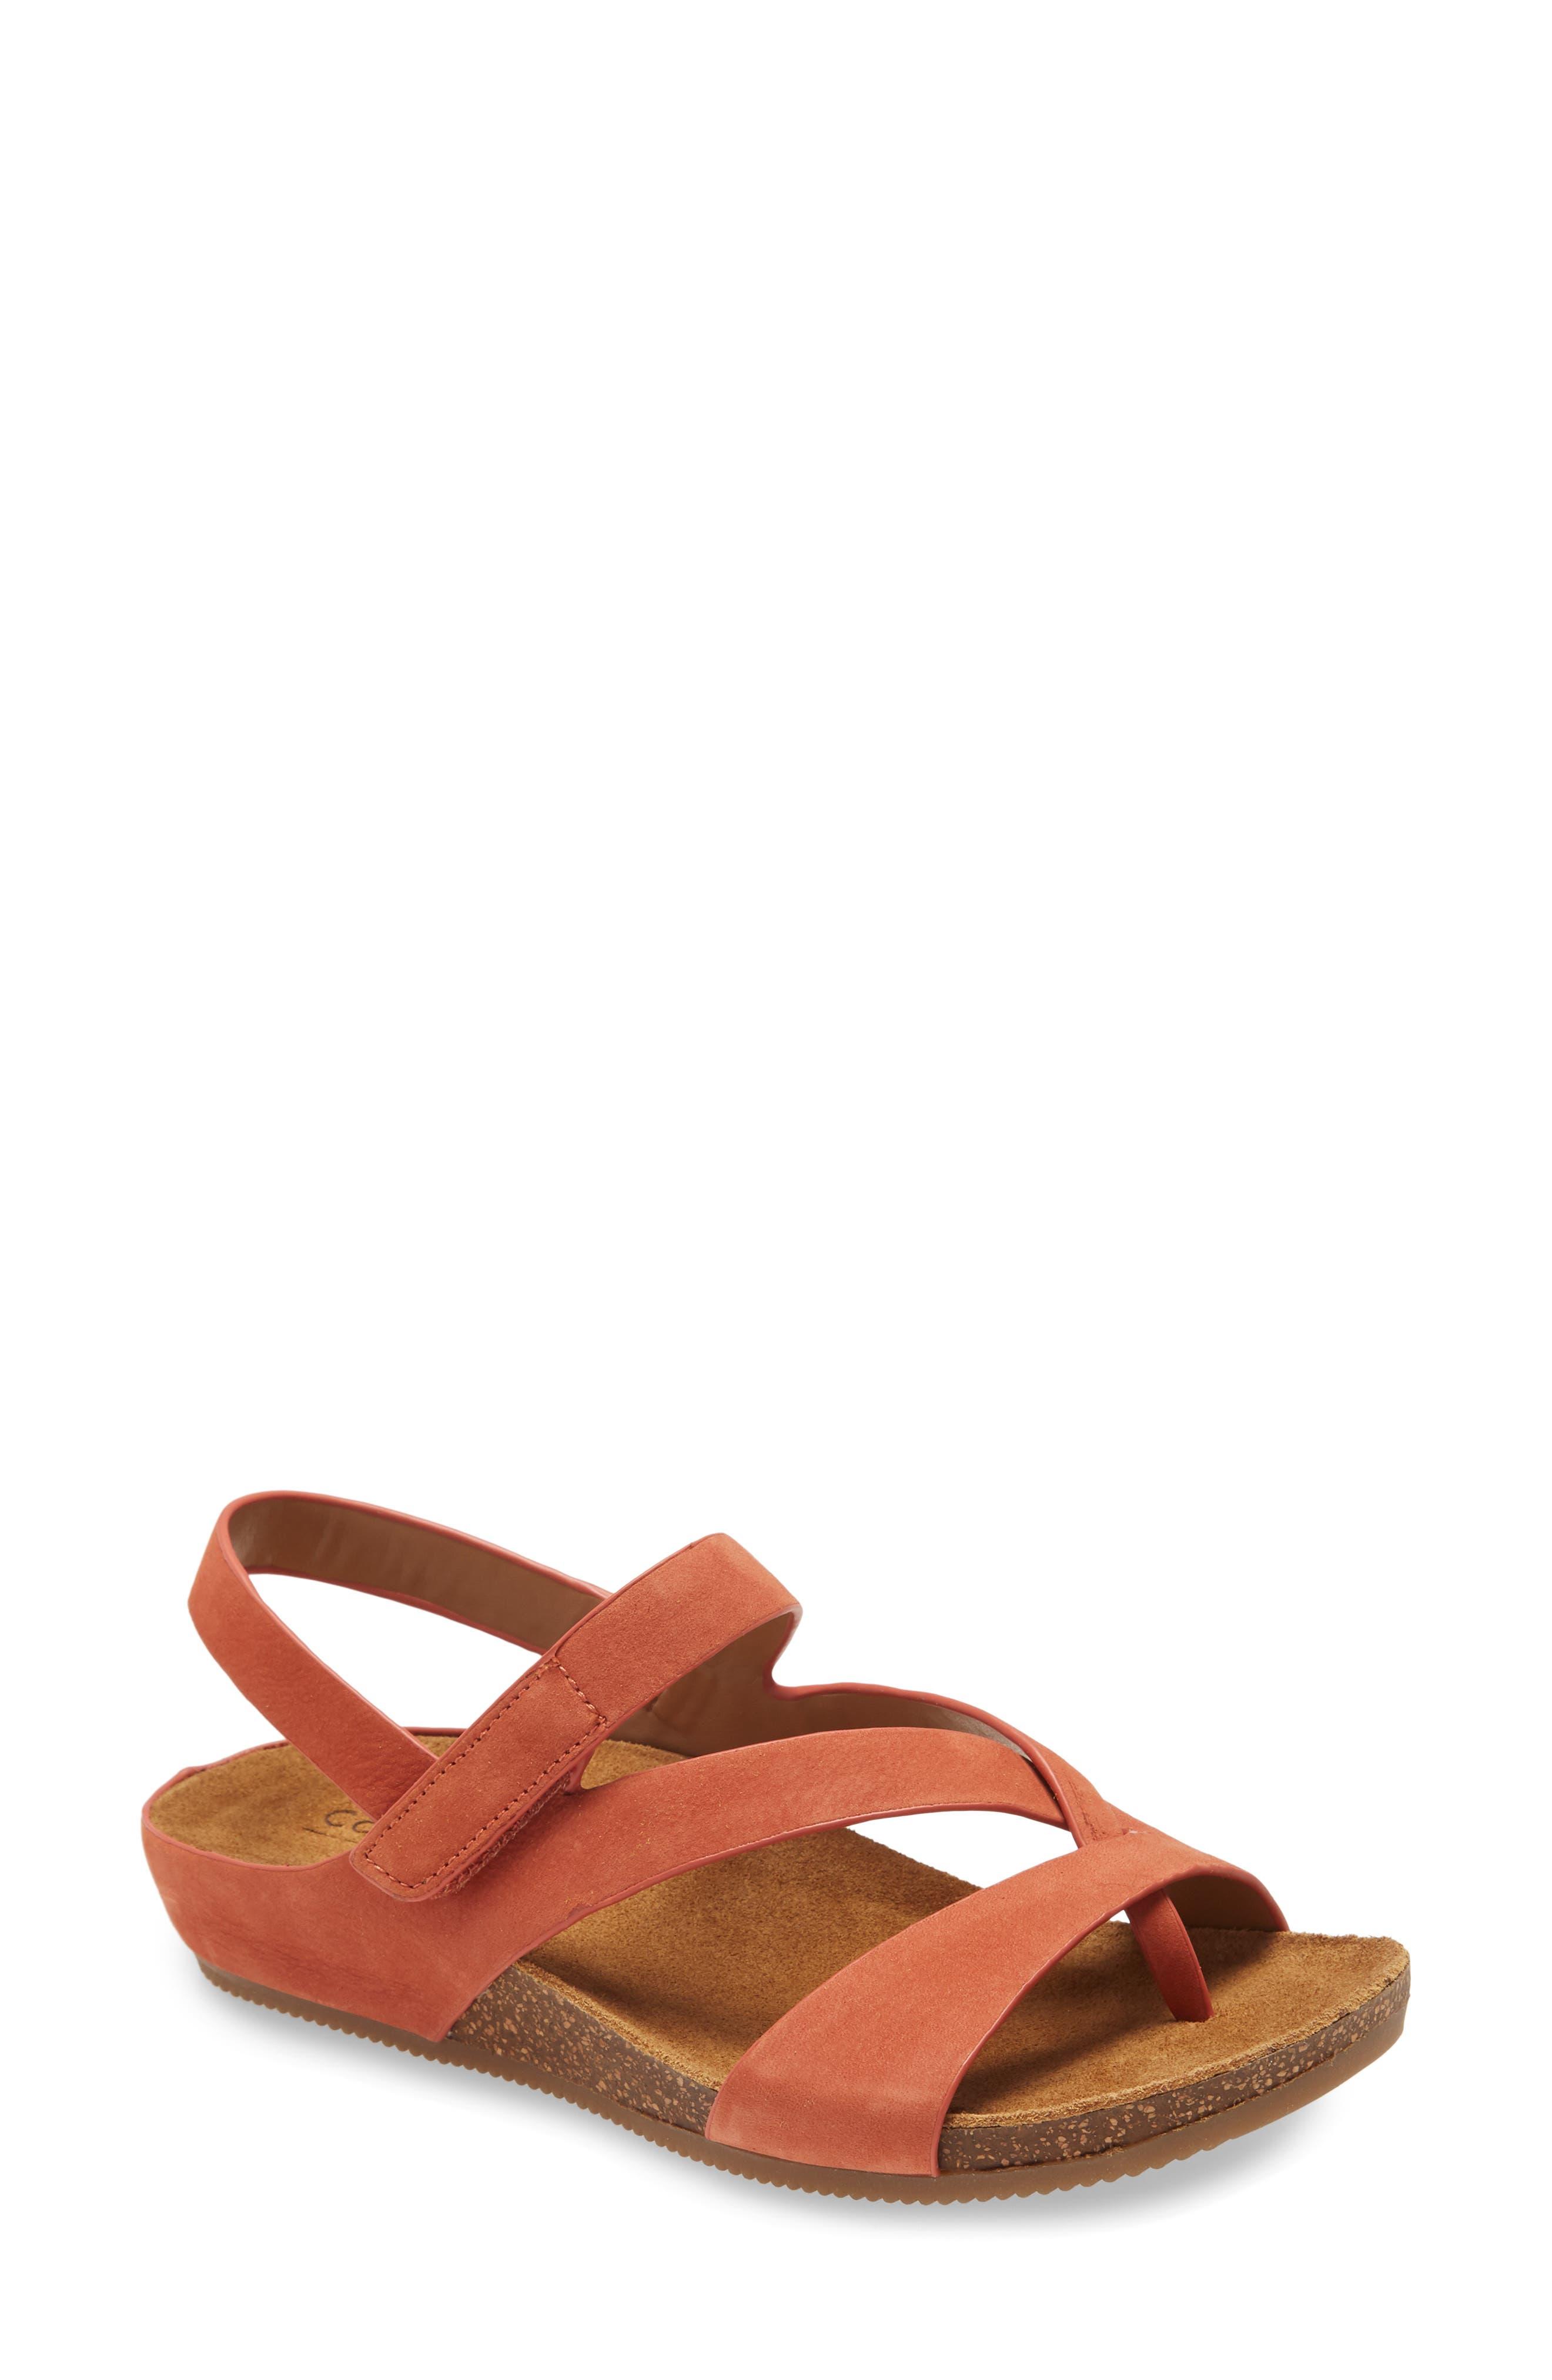 Glora Sandal